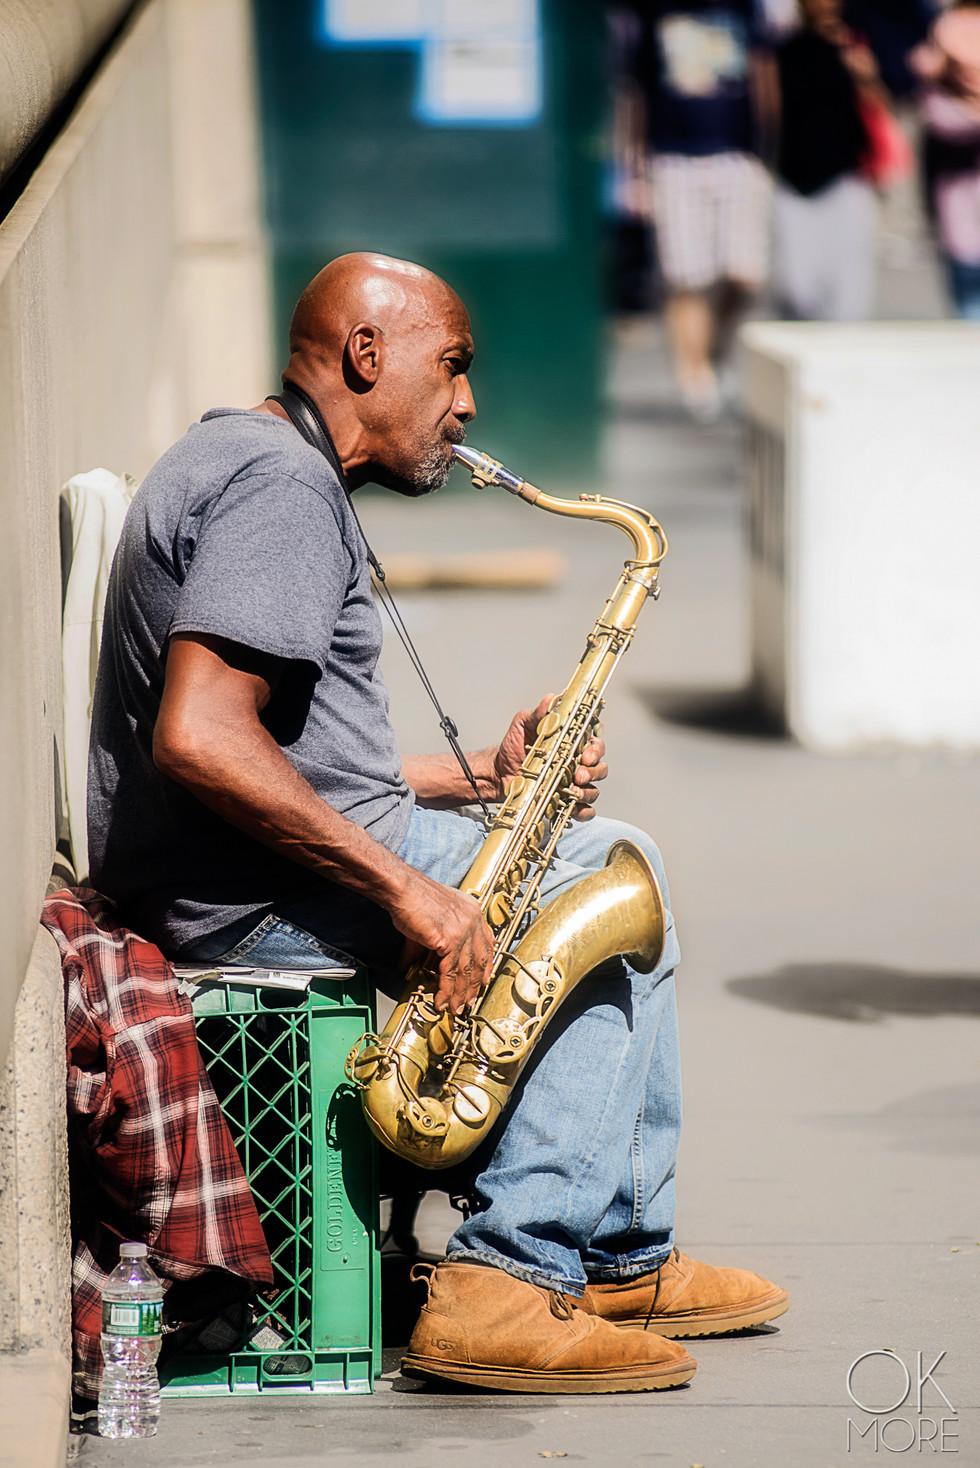 Portrait of a street musician in New York